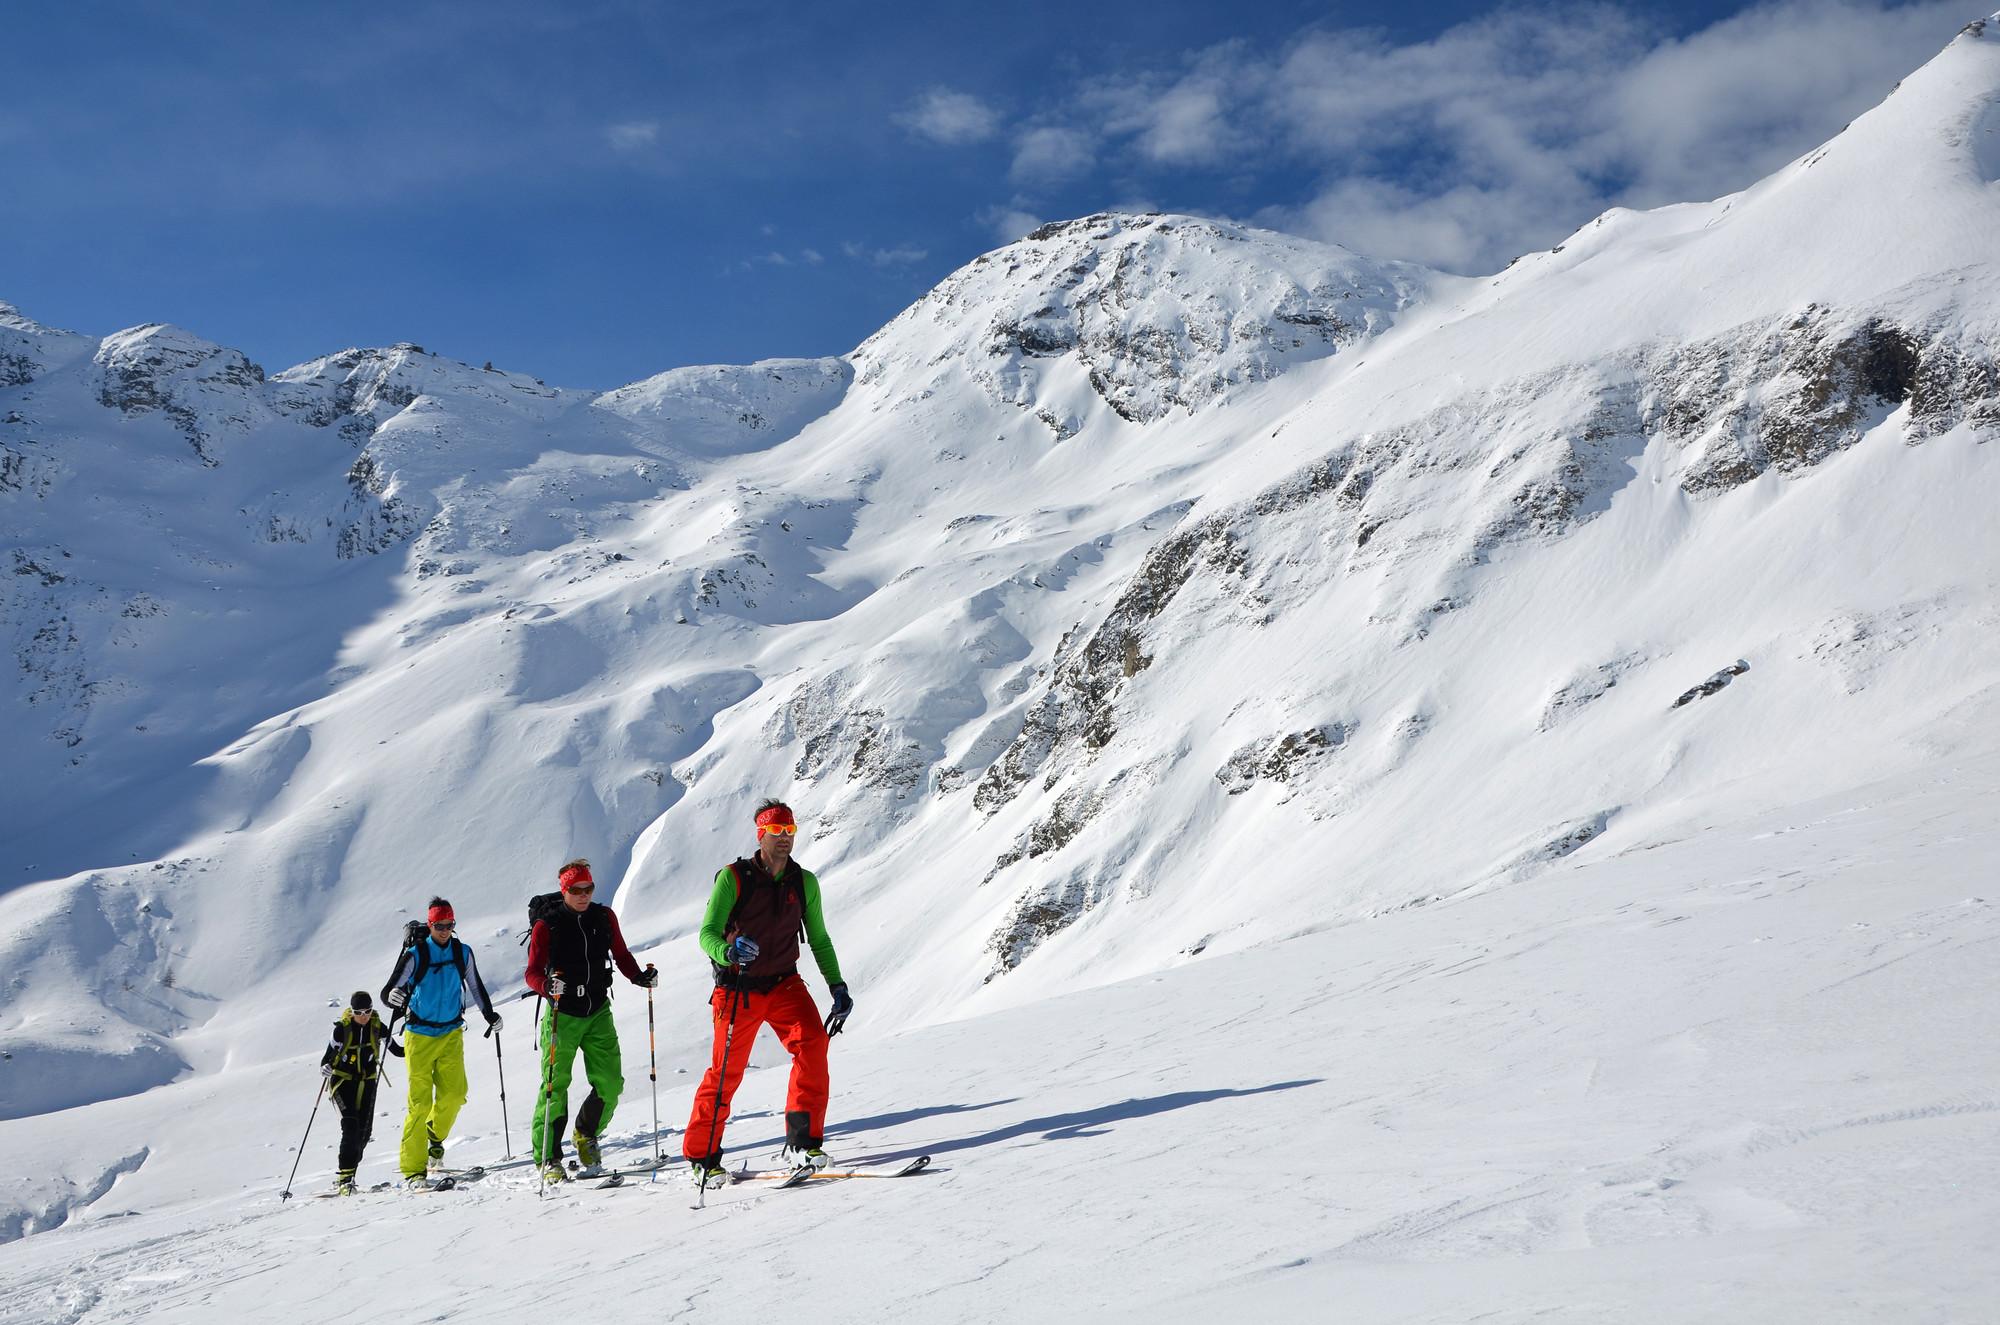 Vier Skitourengeher steigen langsam dem Gipfel entgegen.